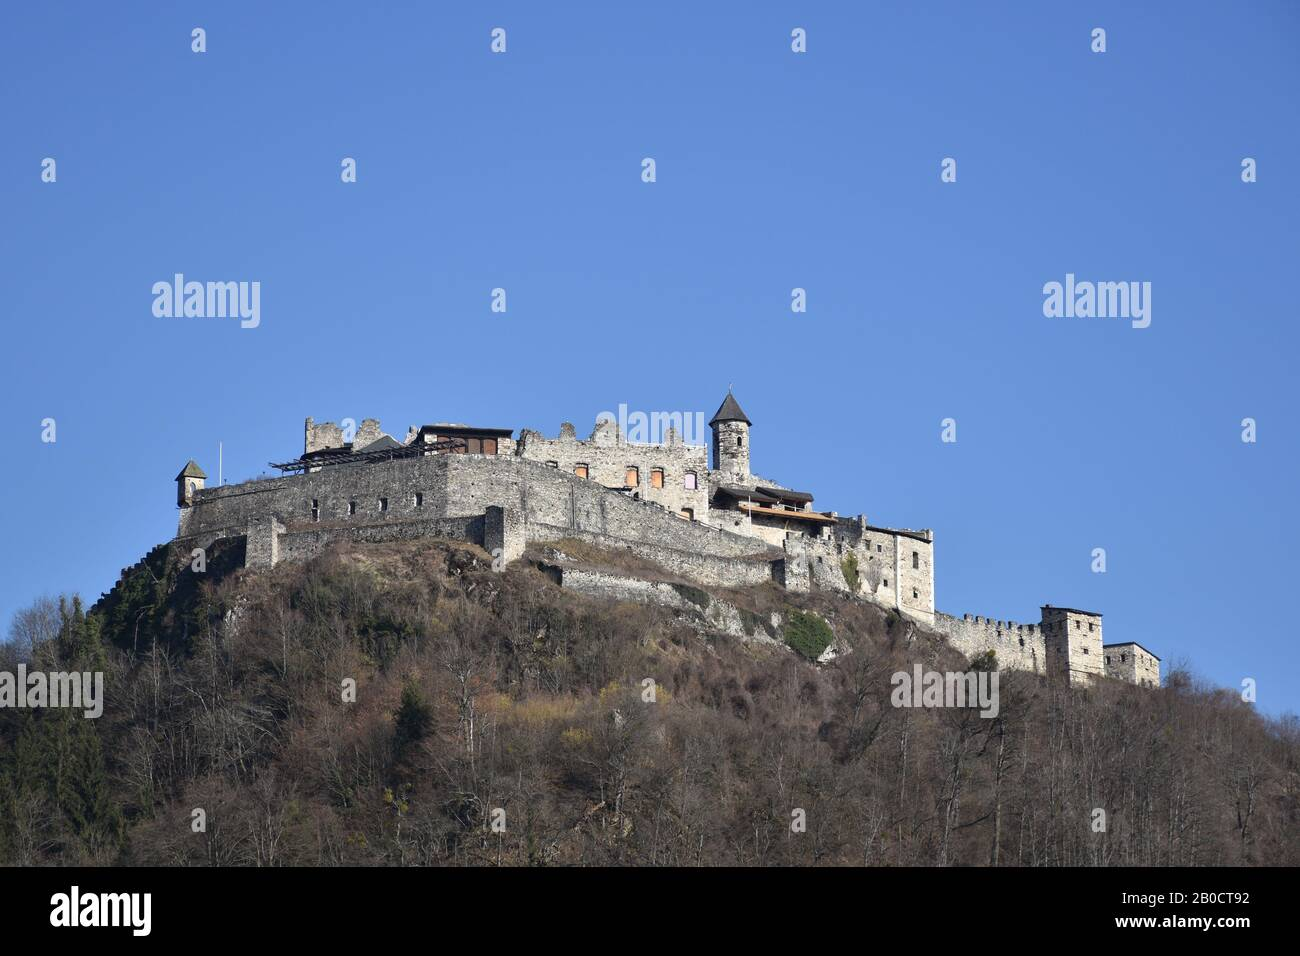 Burg Landskron, Landskron, Kärnten, Villach, Burg, Burgruine, Turm, Festung, Felsenburg, Ossiacher Tauern, Grad Vajskra, Mittelalter, Arena, Höhenburg Foto de stock